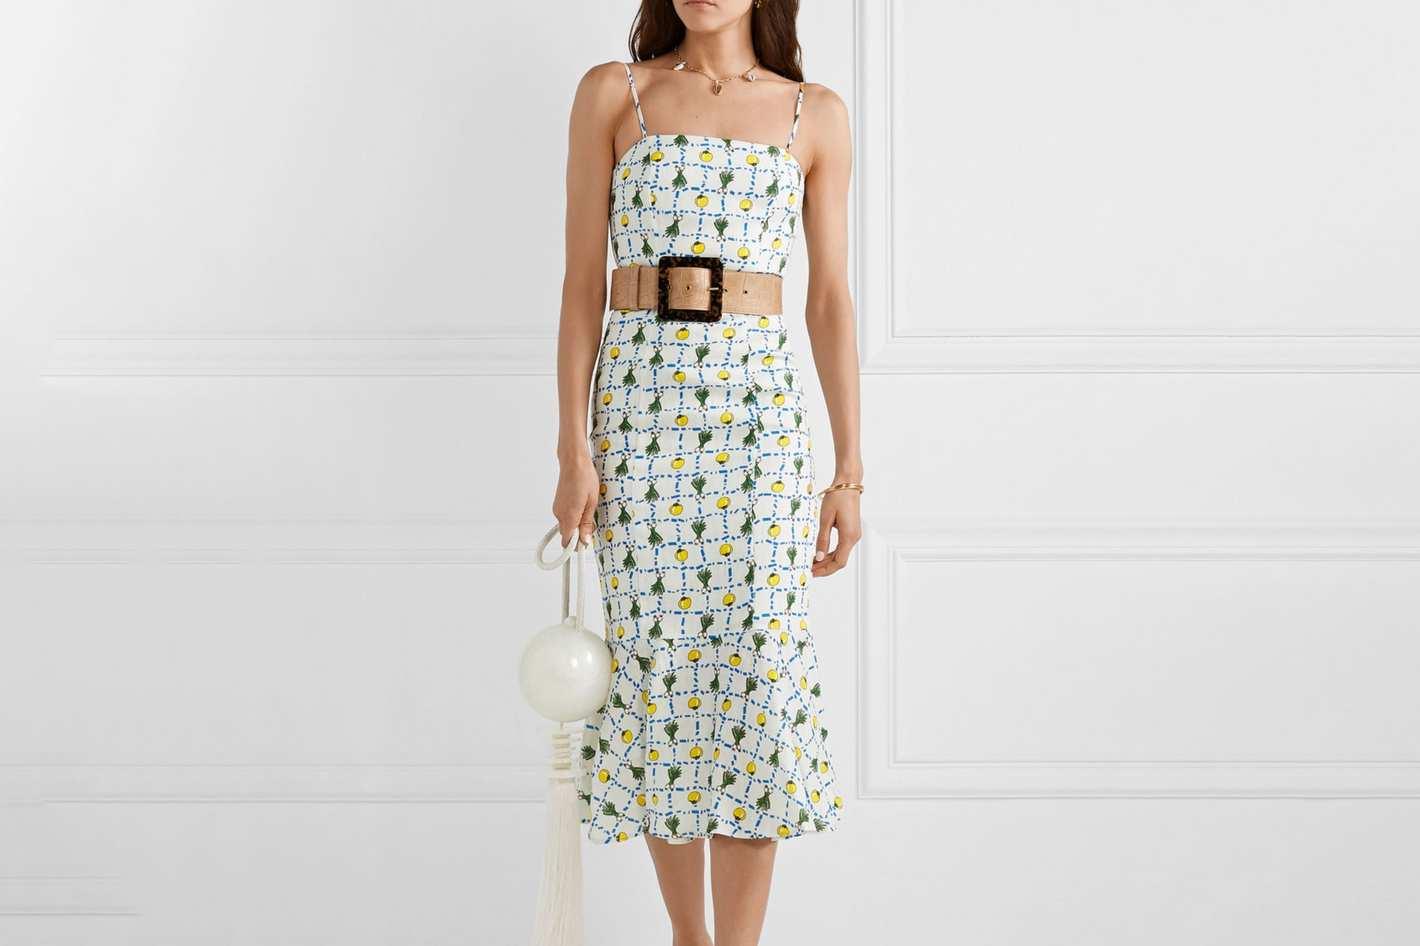 Staud Lychee Printed Linen Dress